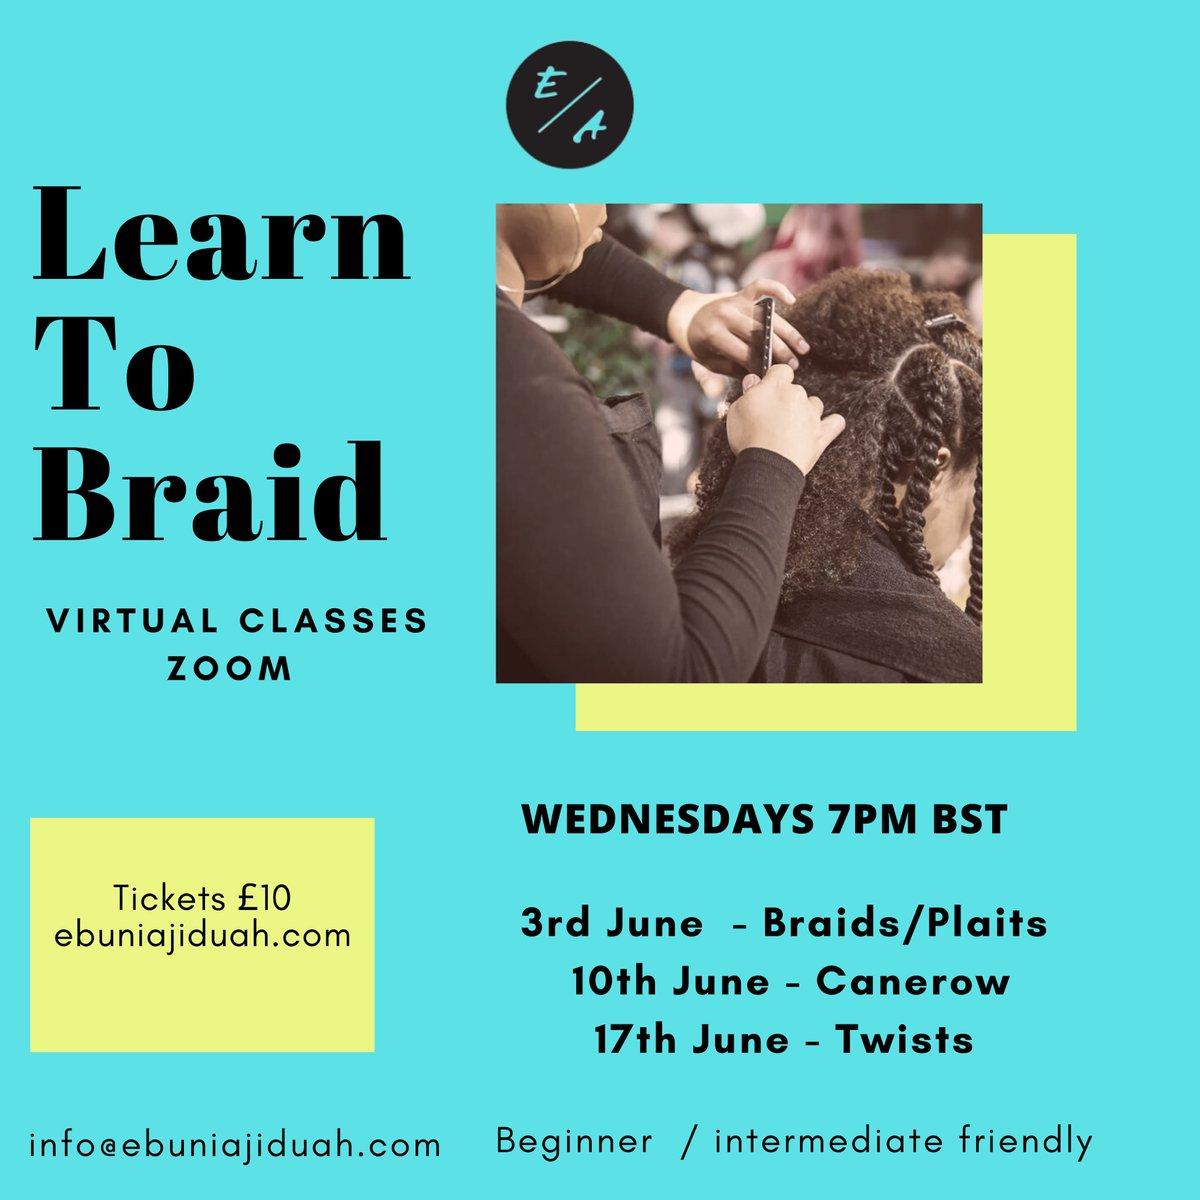 Online canerow class tonight! ebuniajiduah.as.me/learntobraid